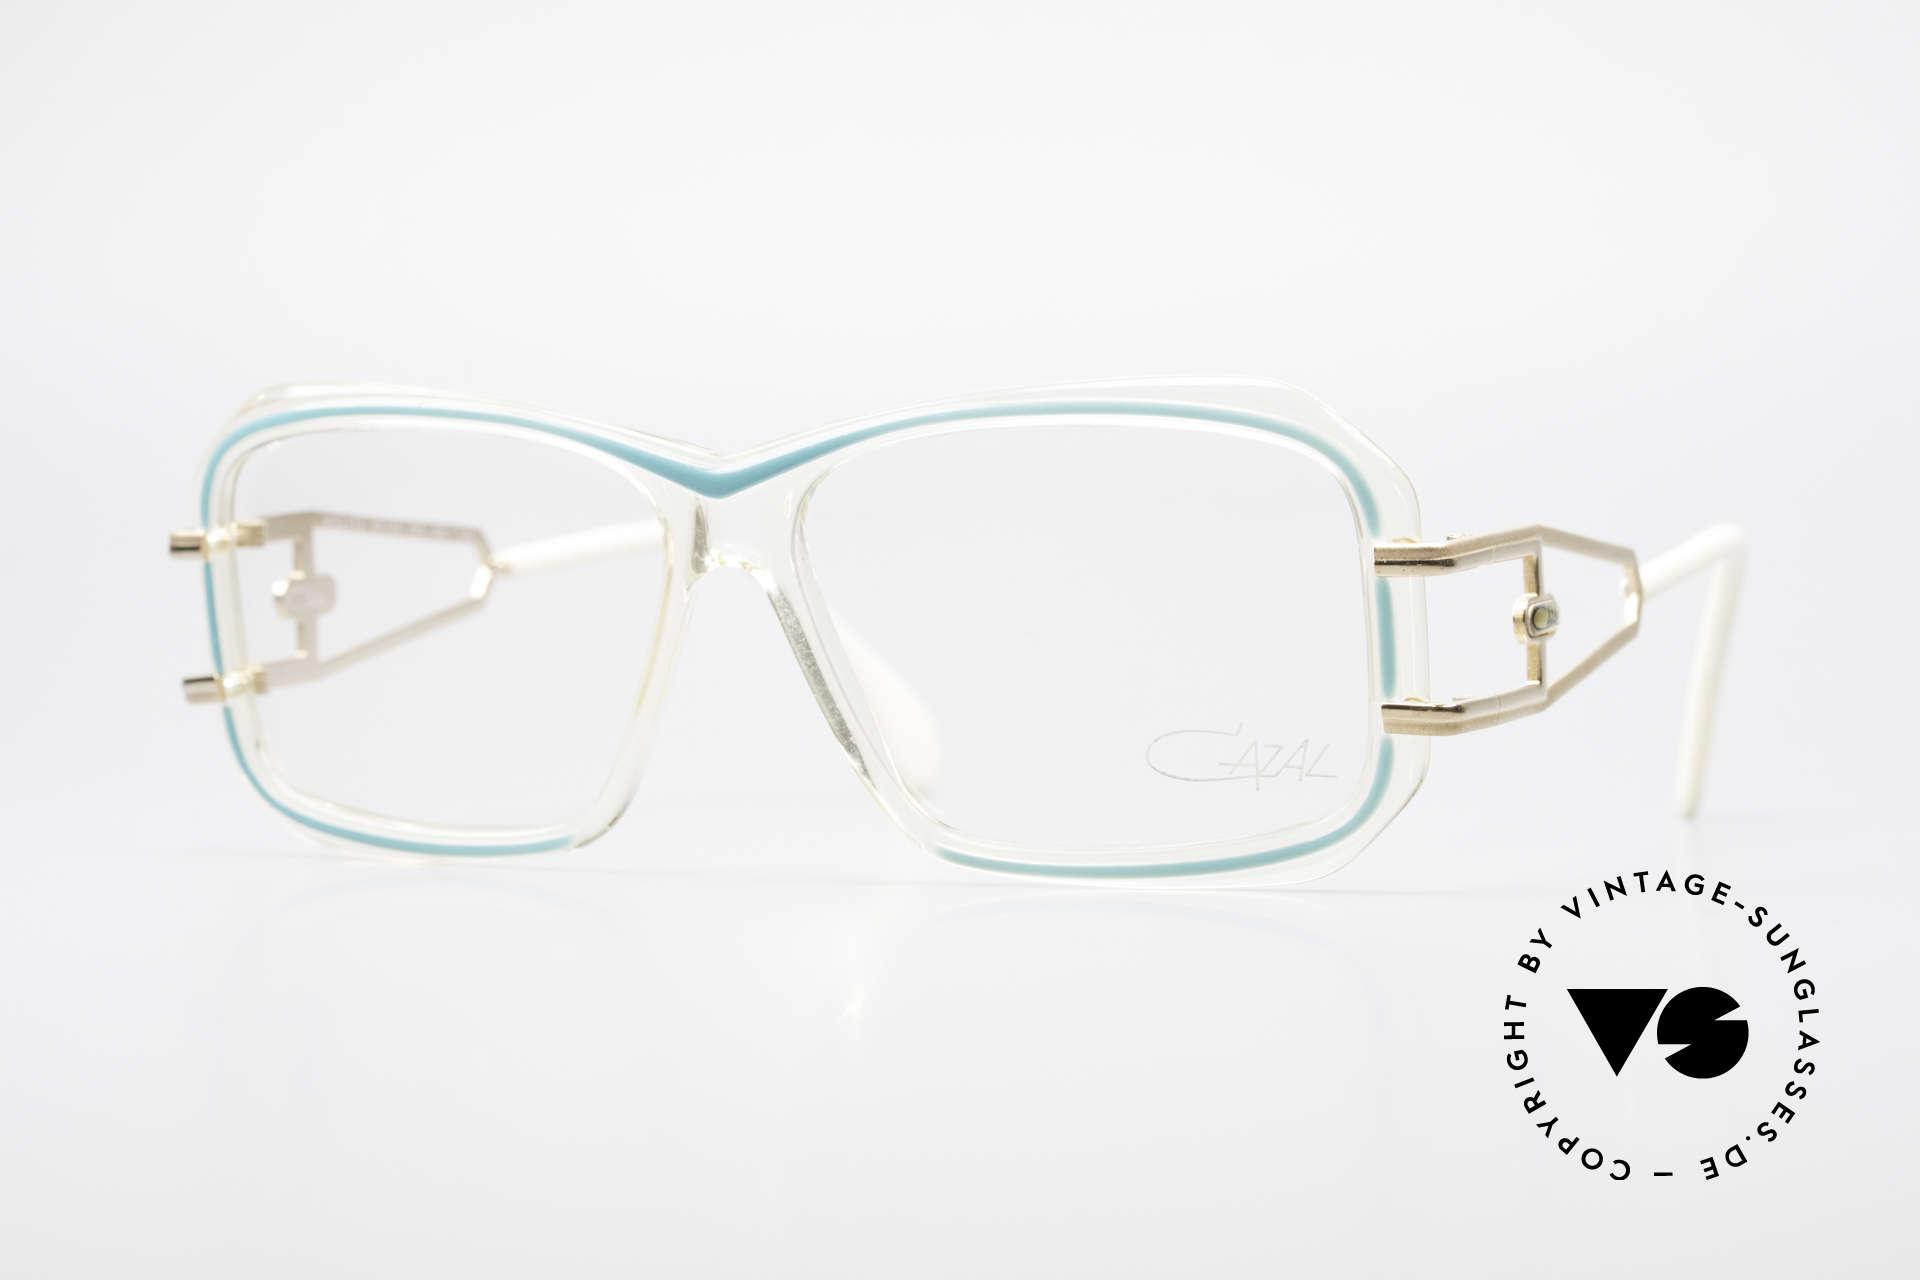 Cazal 173 Hip Hop Cazal 80's Glasses, legendary Cazal design; directly from the 1980's, Made for Women